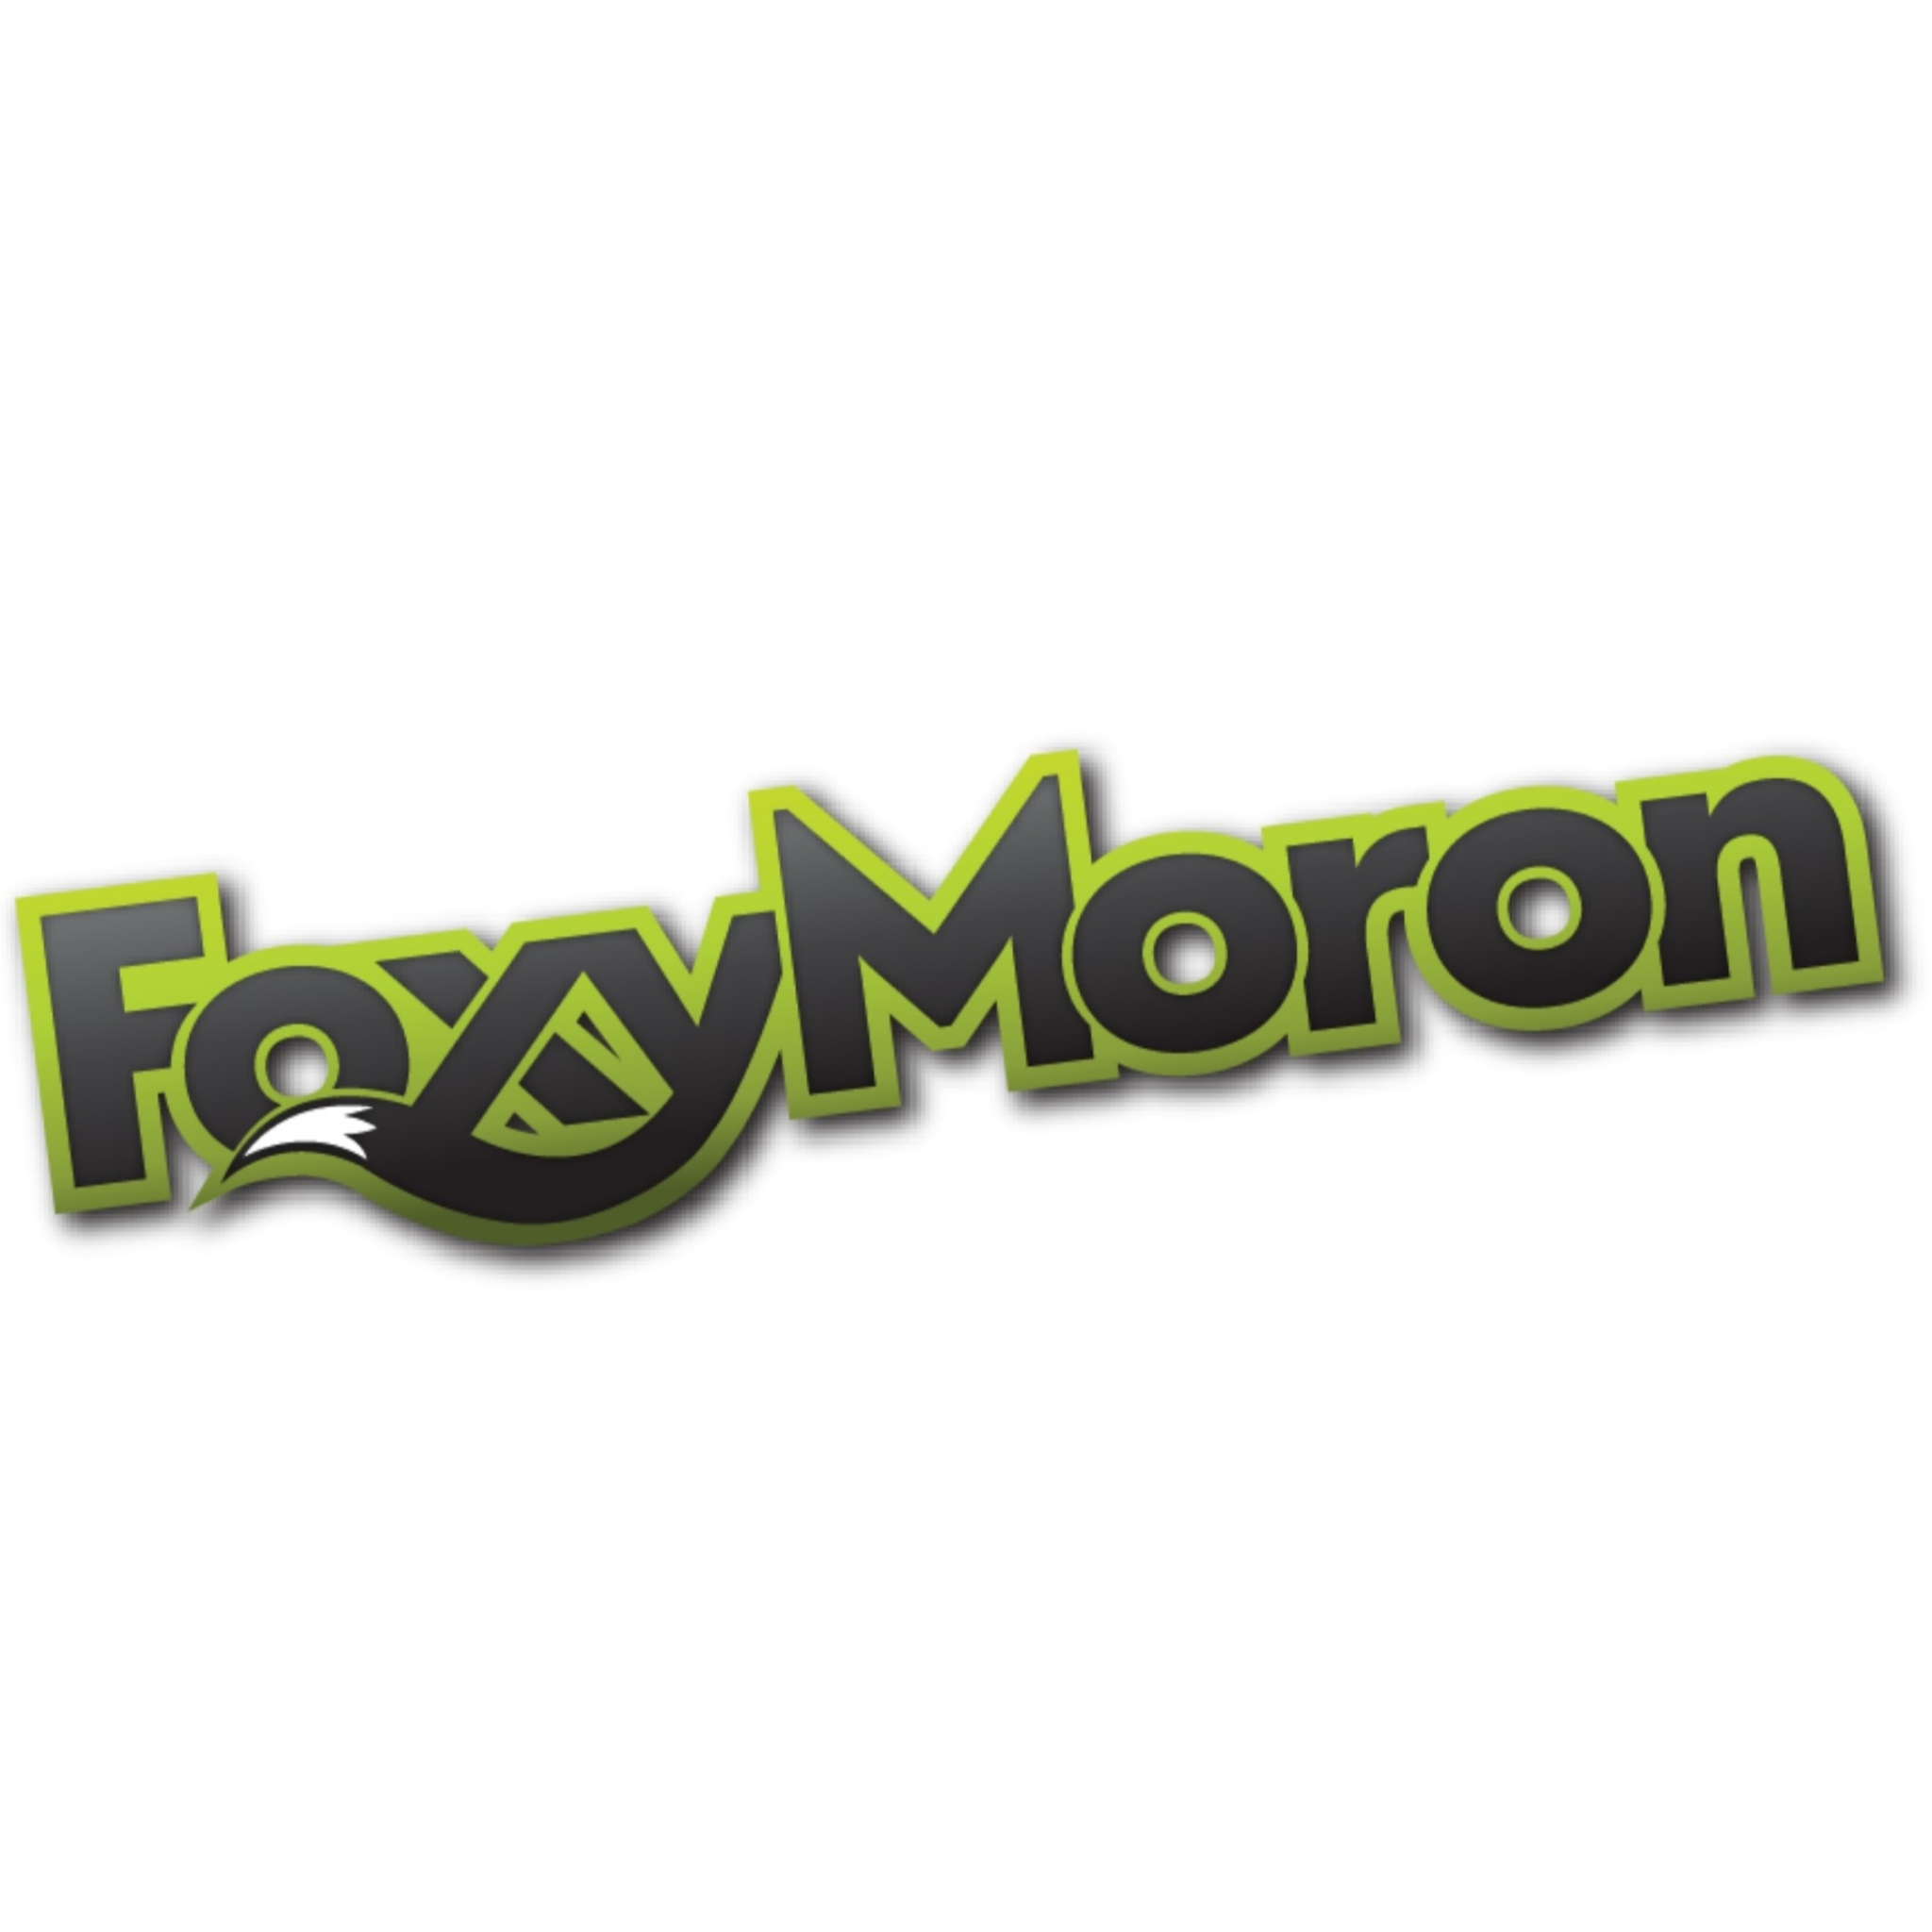 Foxy Moron logo